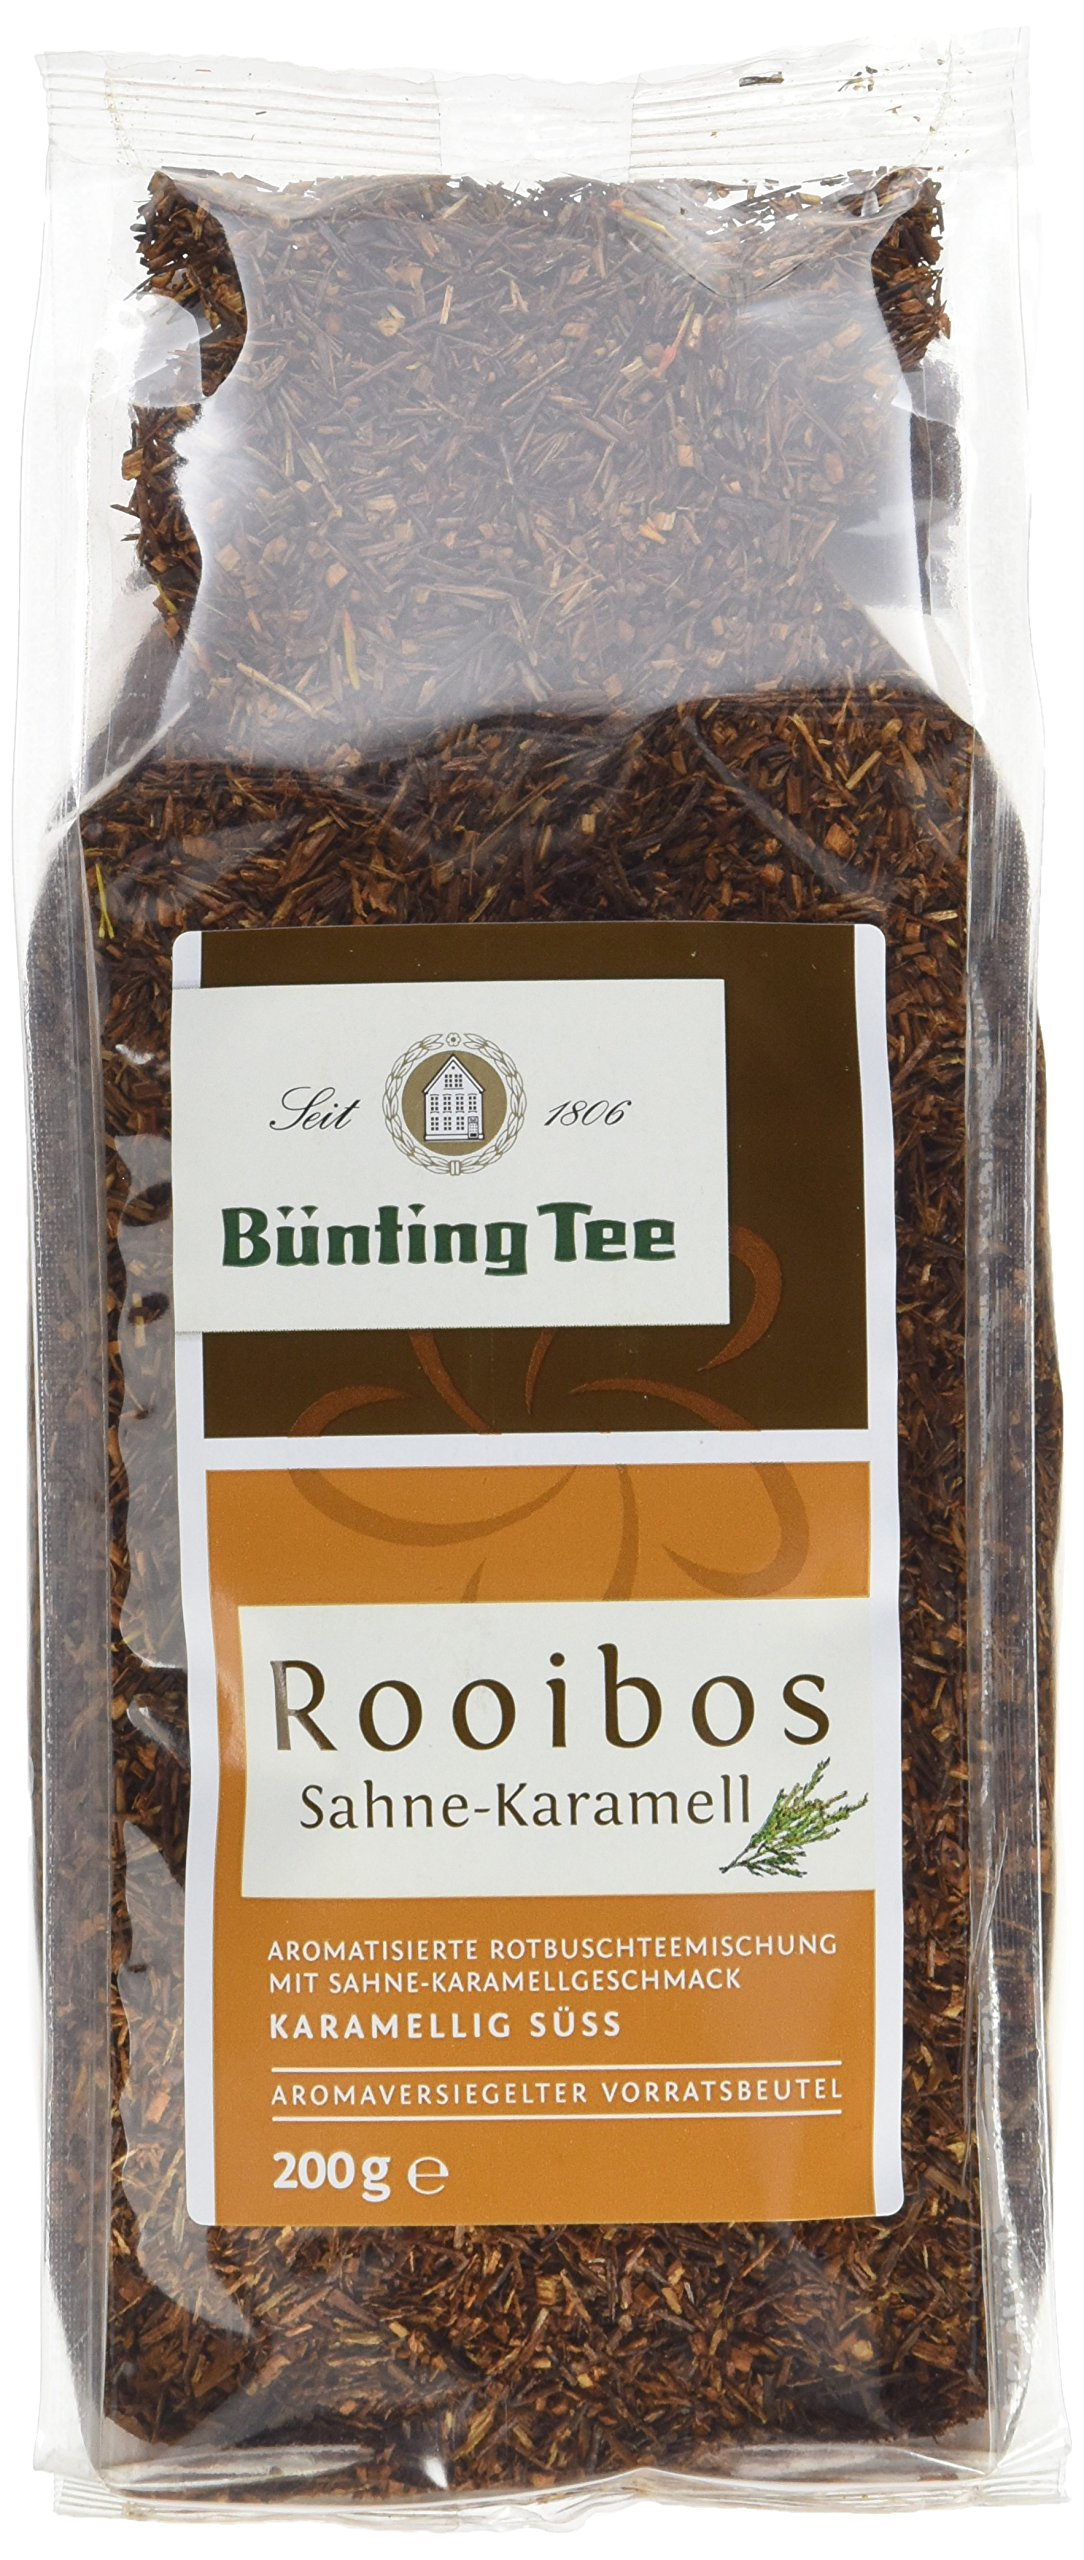 Bnting-Tee-Rooibos-Sahne-Karamell-6er-Pack-6-x-200-g